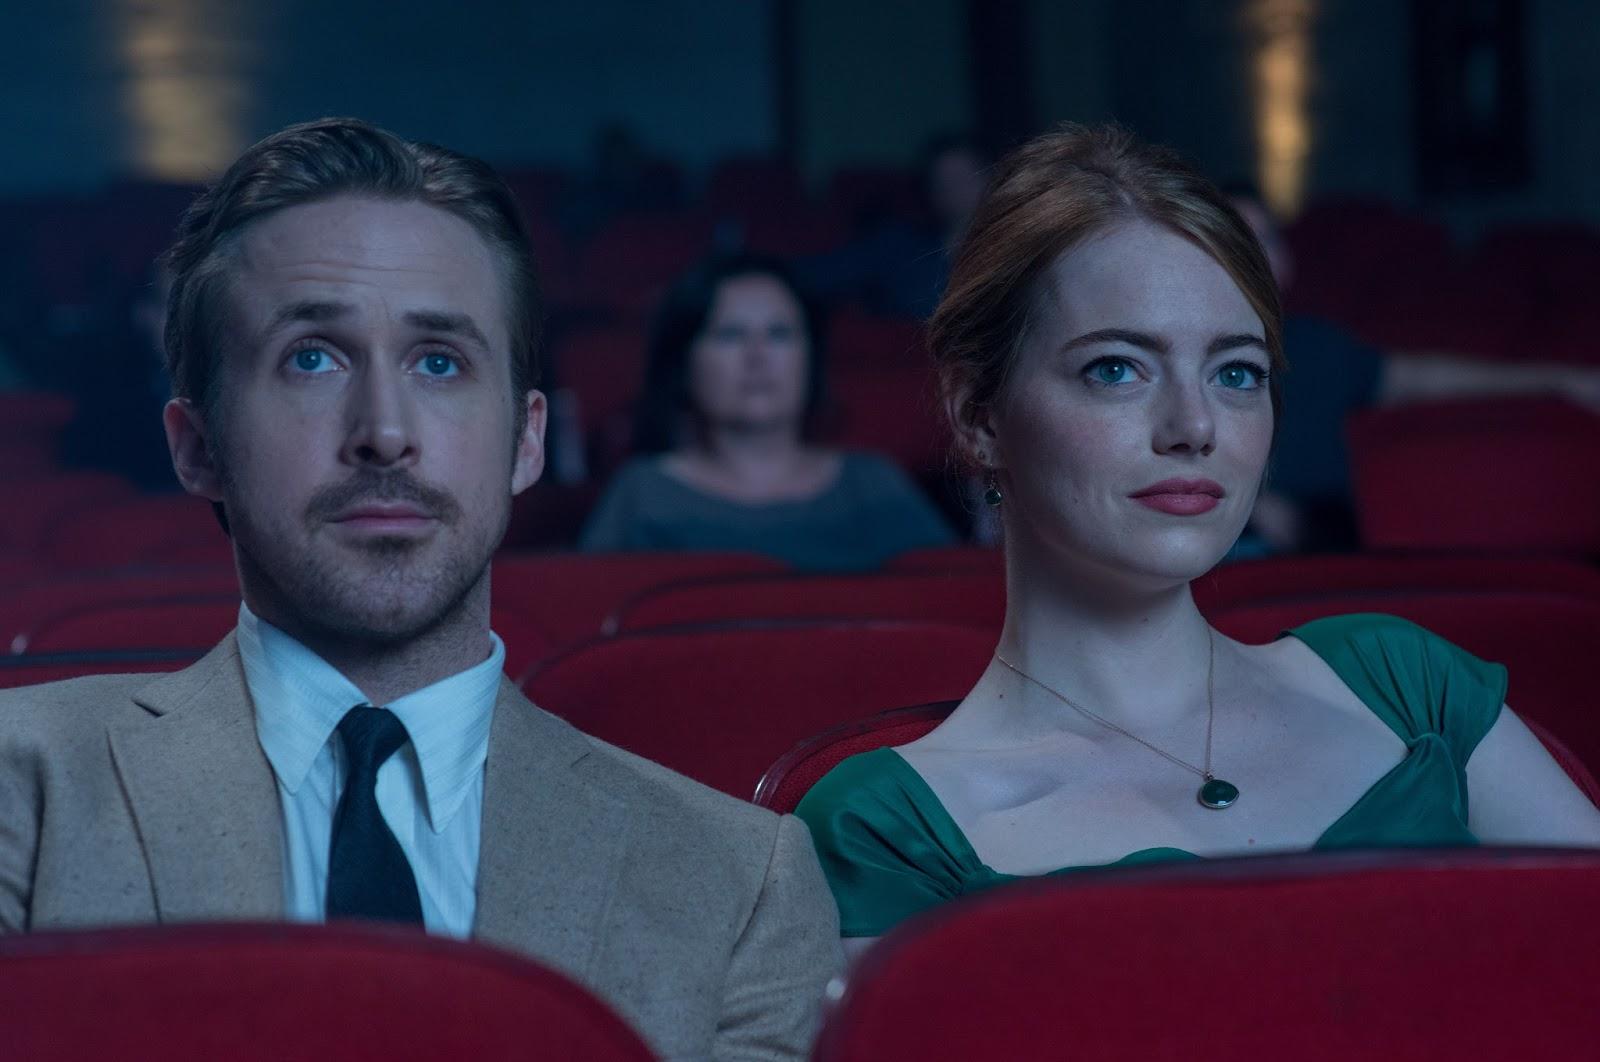 Emma Stone y Ryan Gosling - LaLaLand